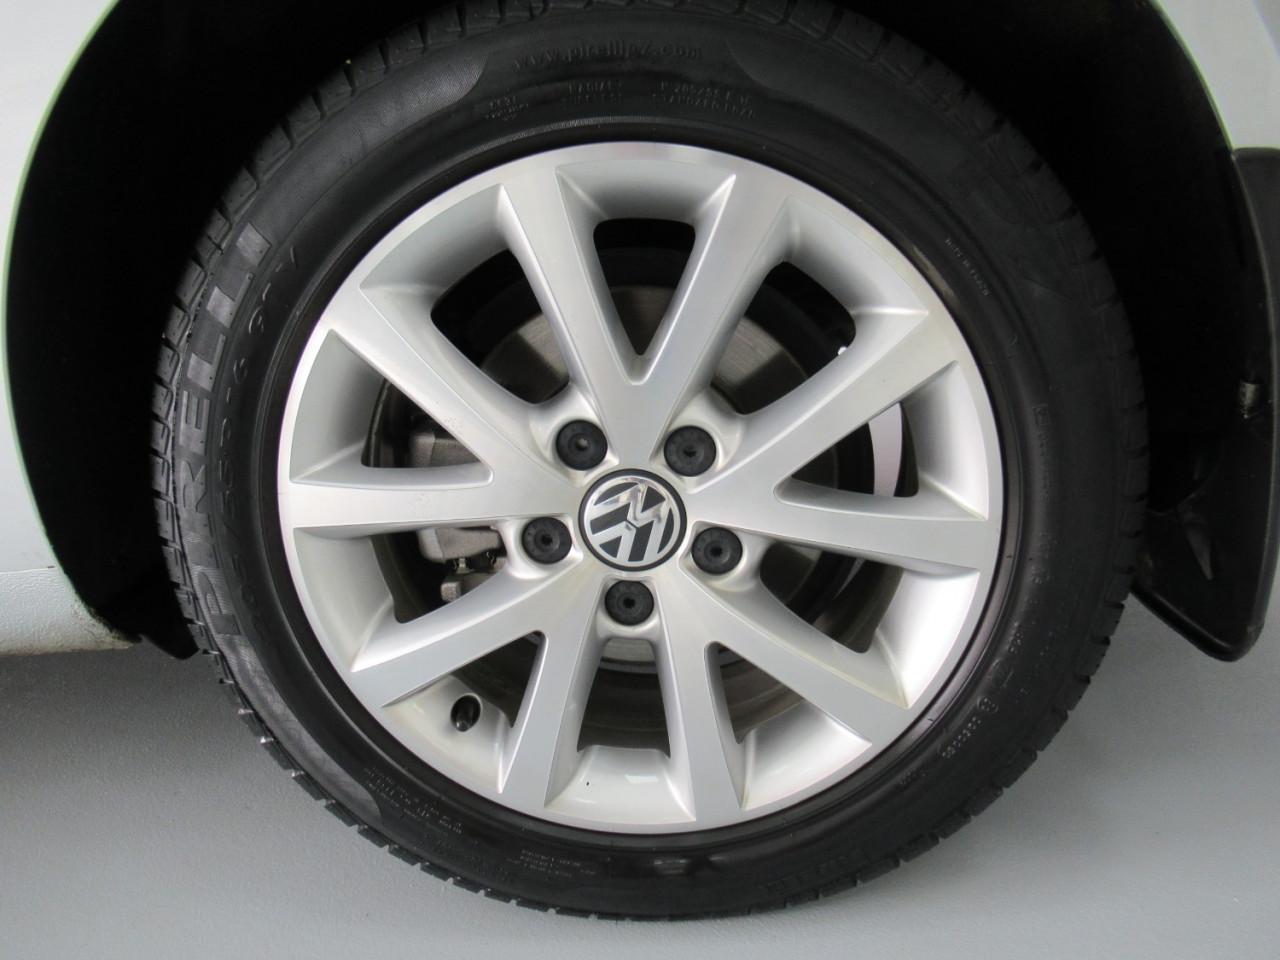 2010 Volkswagen Jetta 1KM MY10 103TDI Sedan Image 13